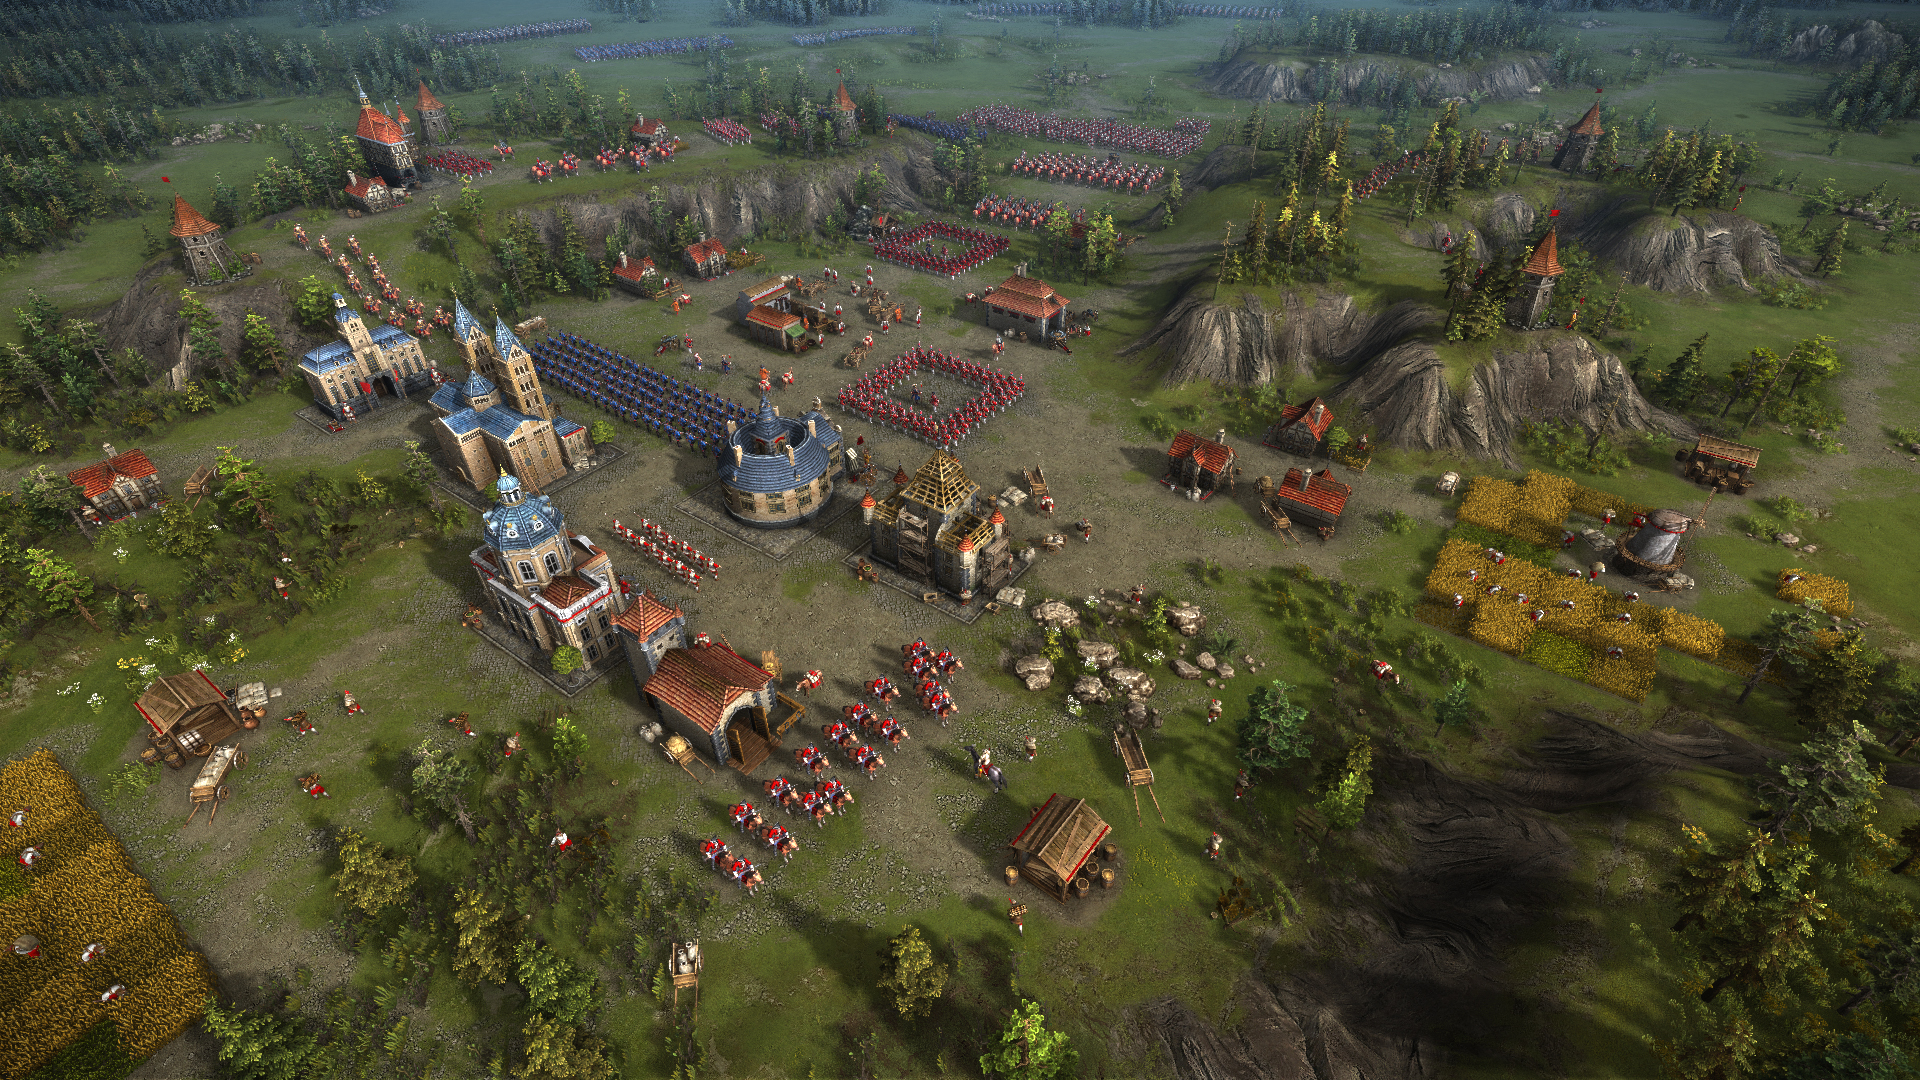 Deluxe Content - Cossacks 3: Days of Brilliance